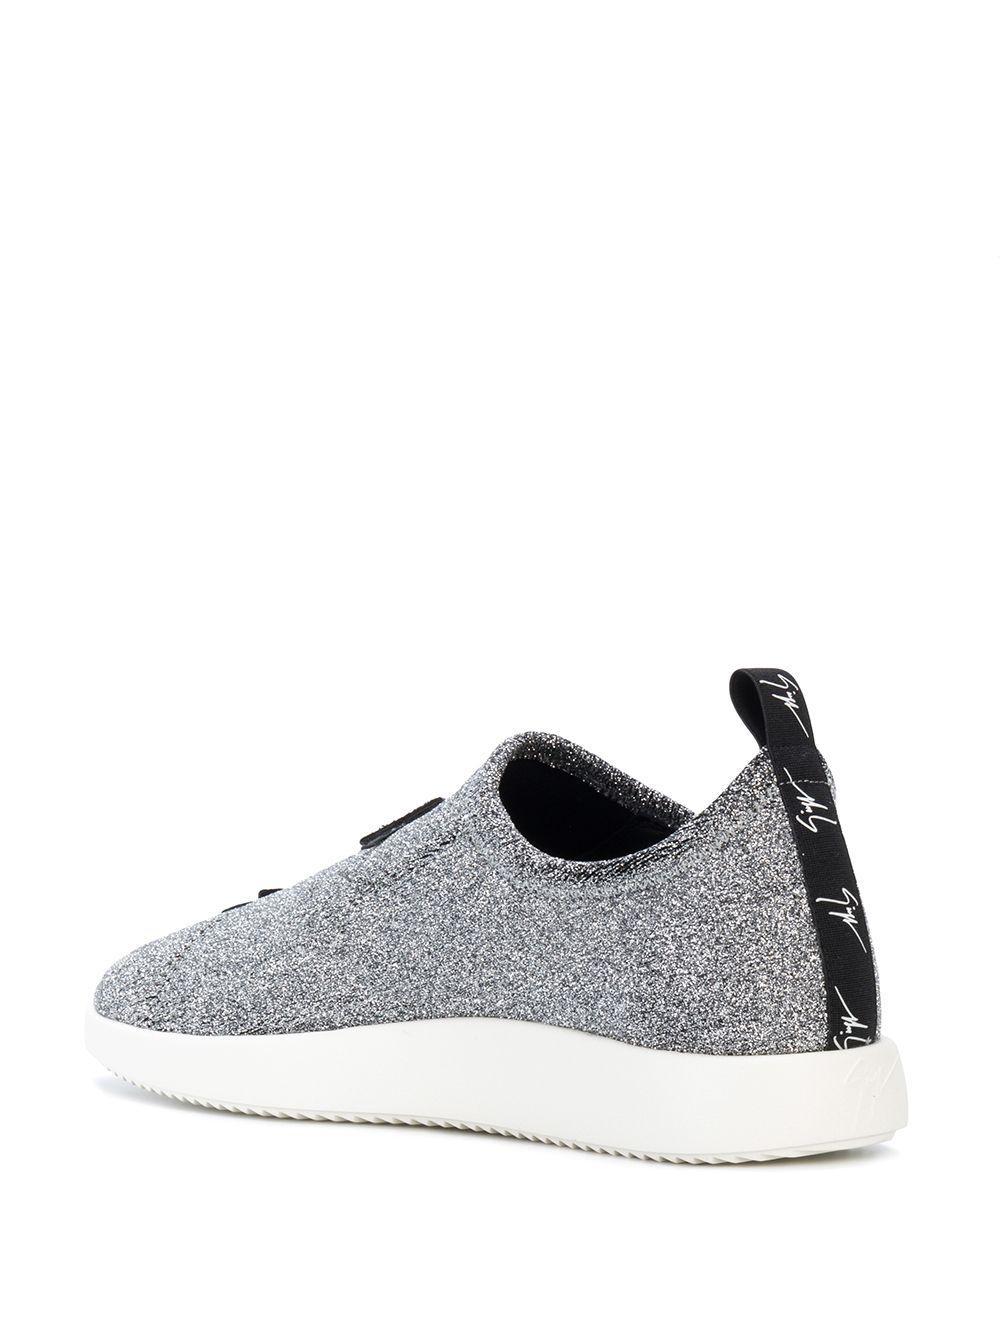 Giuseppe Zanotti Leather Alena Star Sneakers in Silver (Metallic)